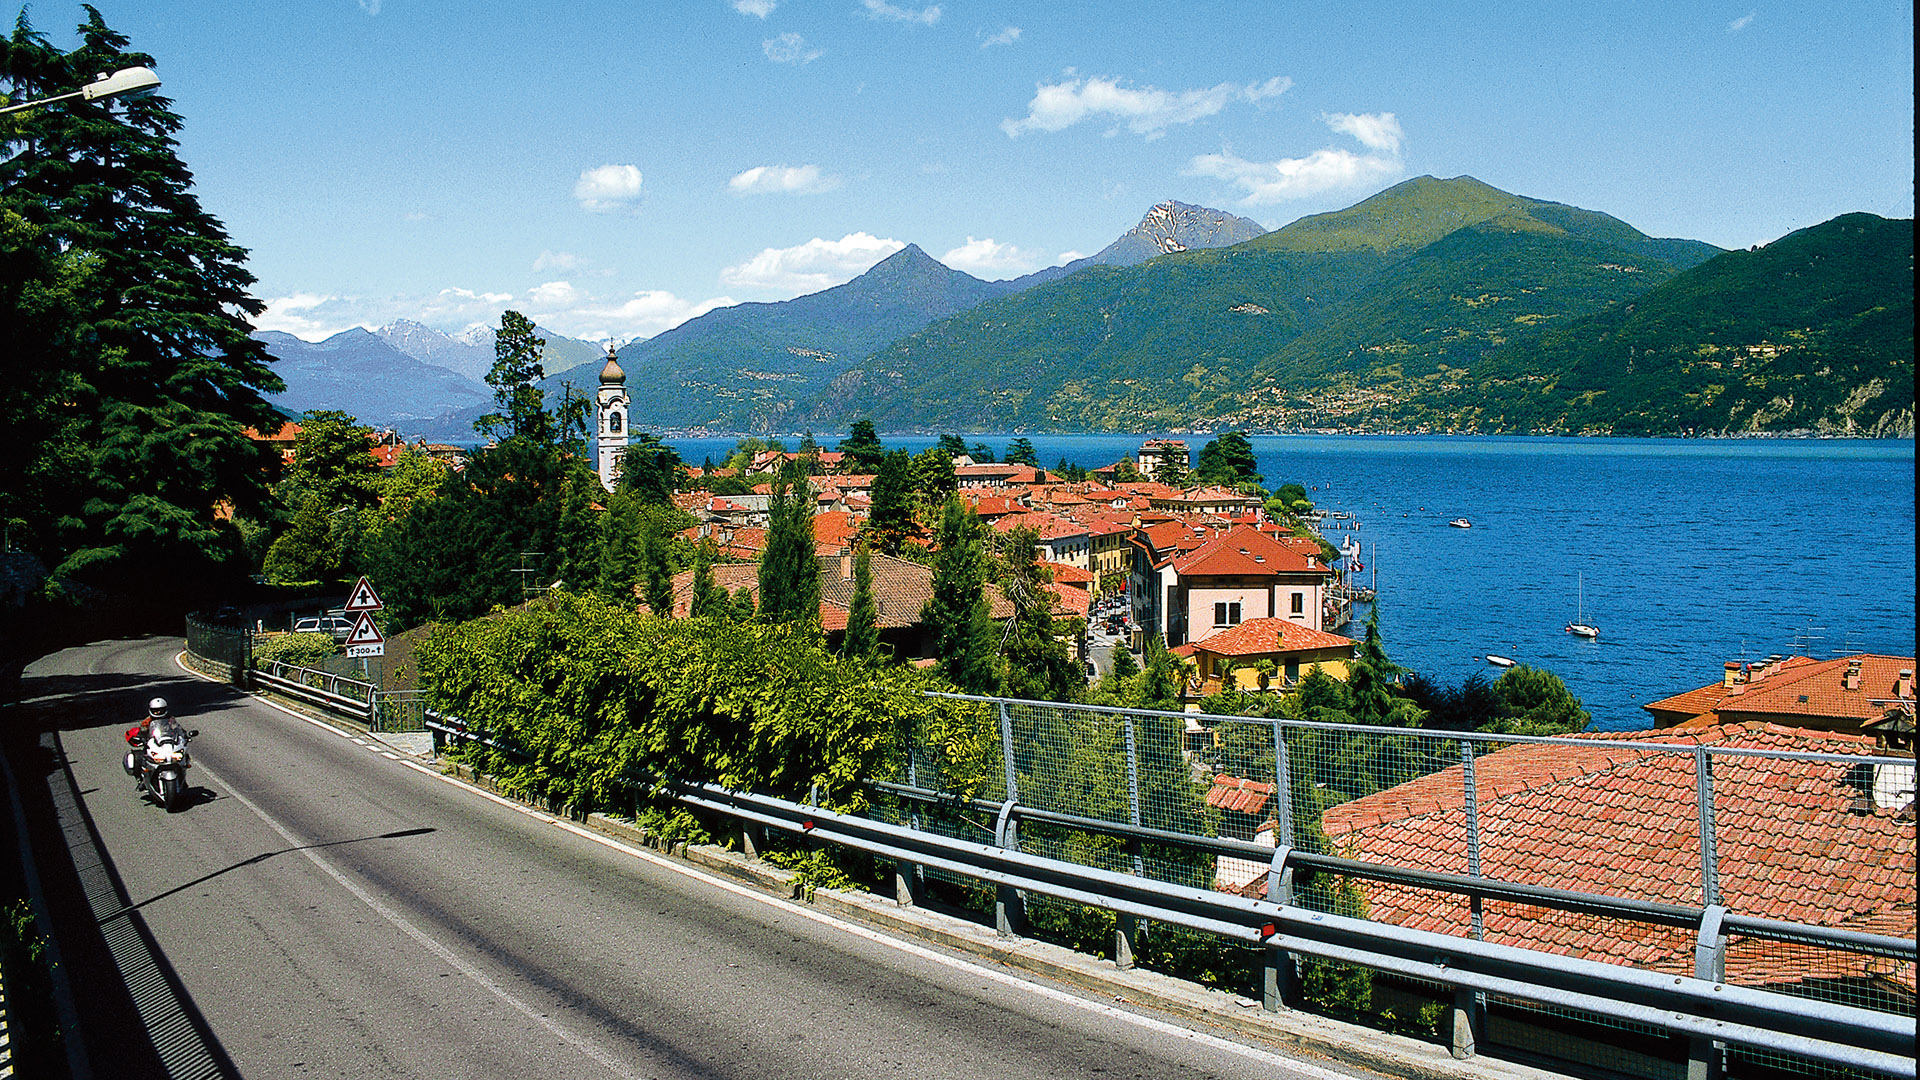 Wasserspiele - Tour 1.1: Lago di Garda